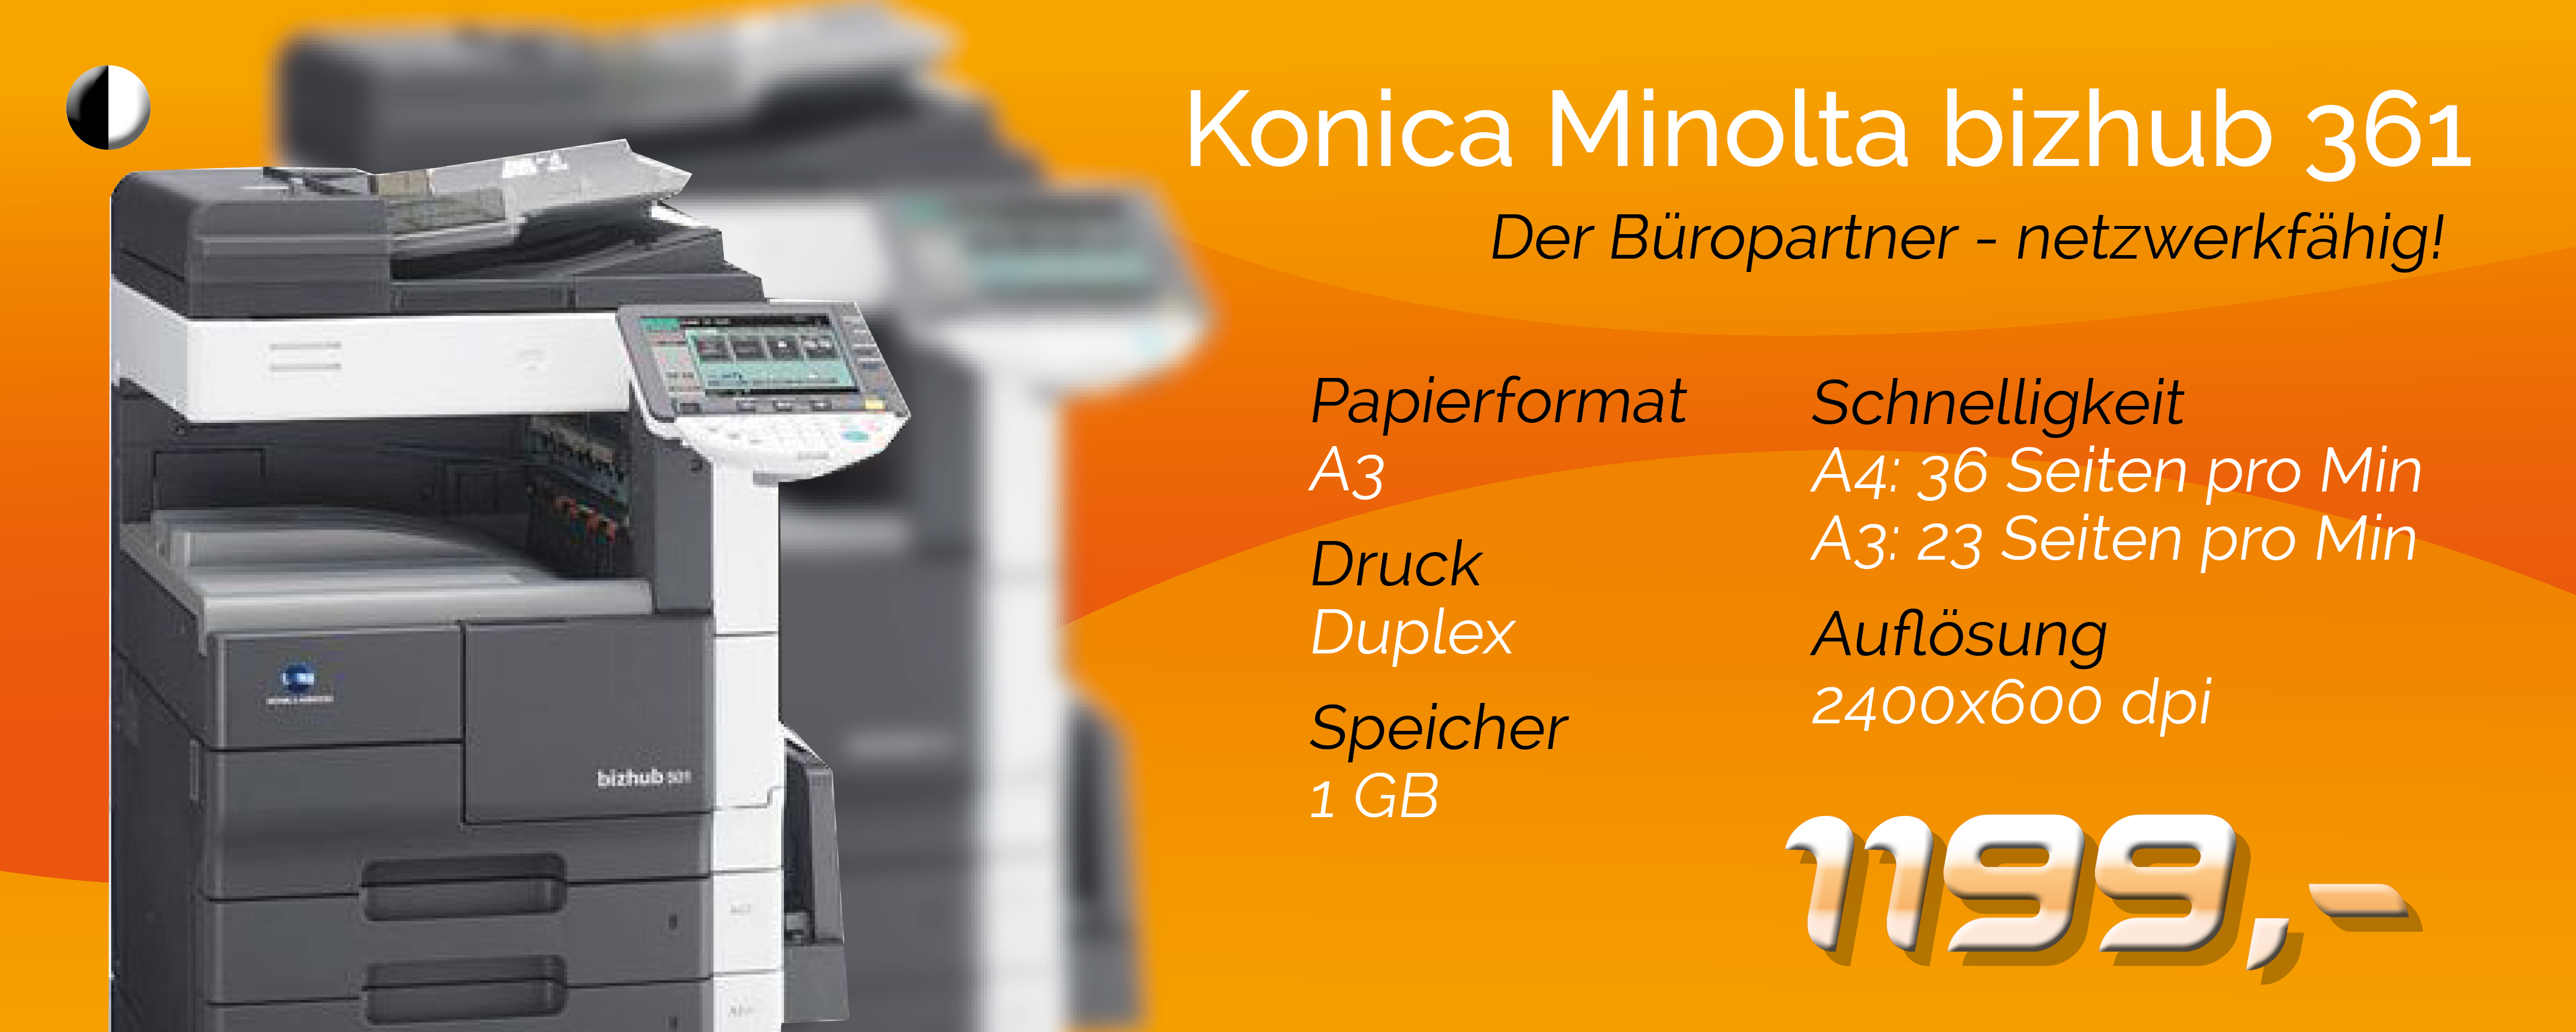 Angebot Konica Minolta bizhub 361